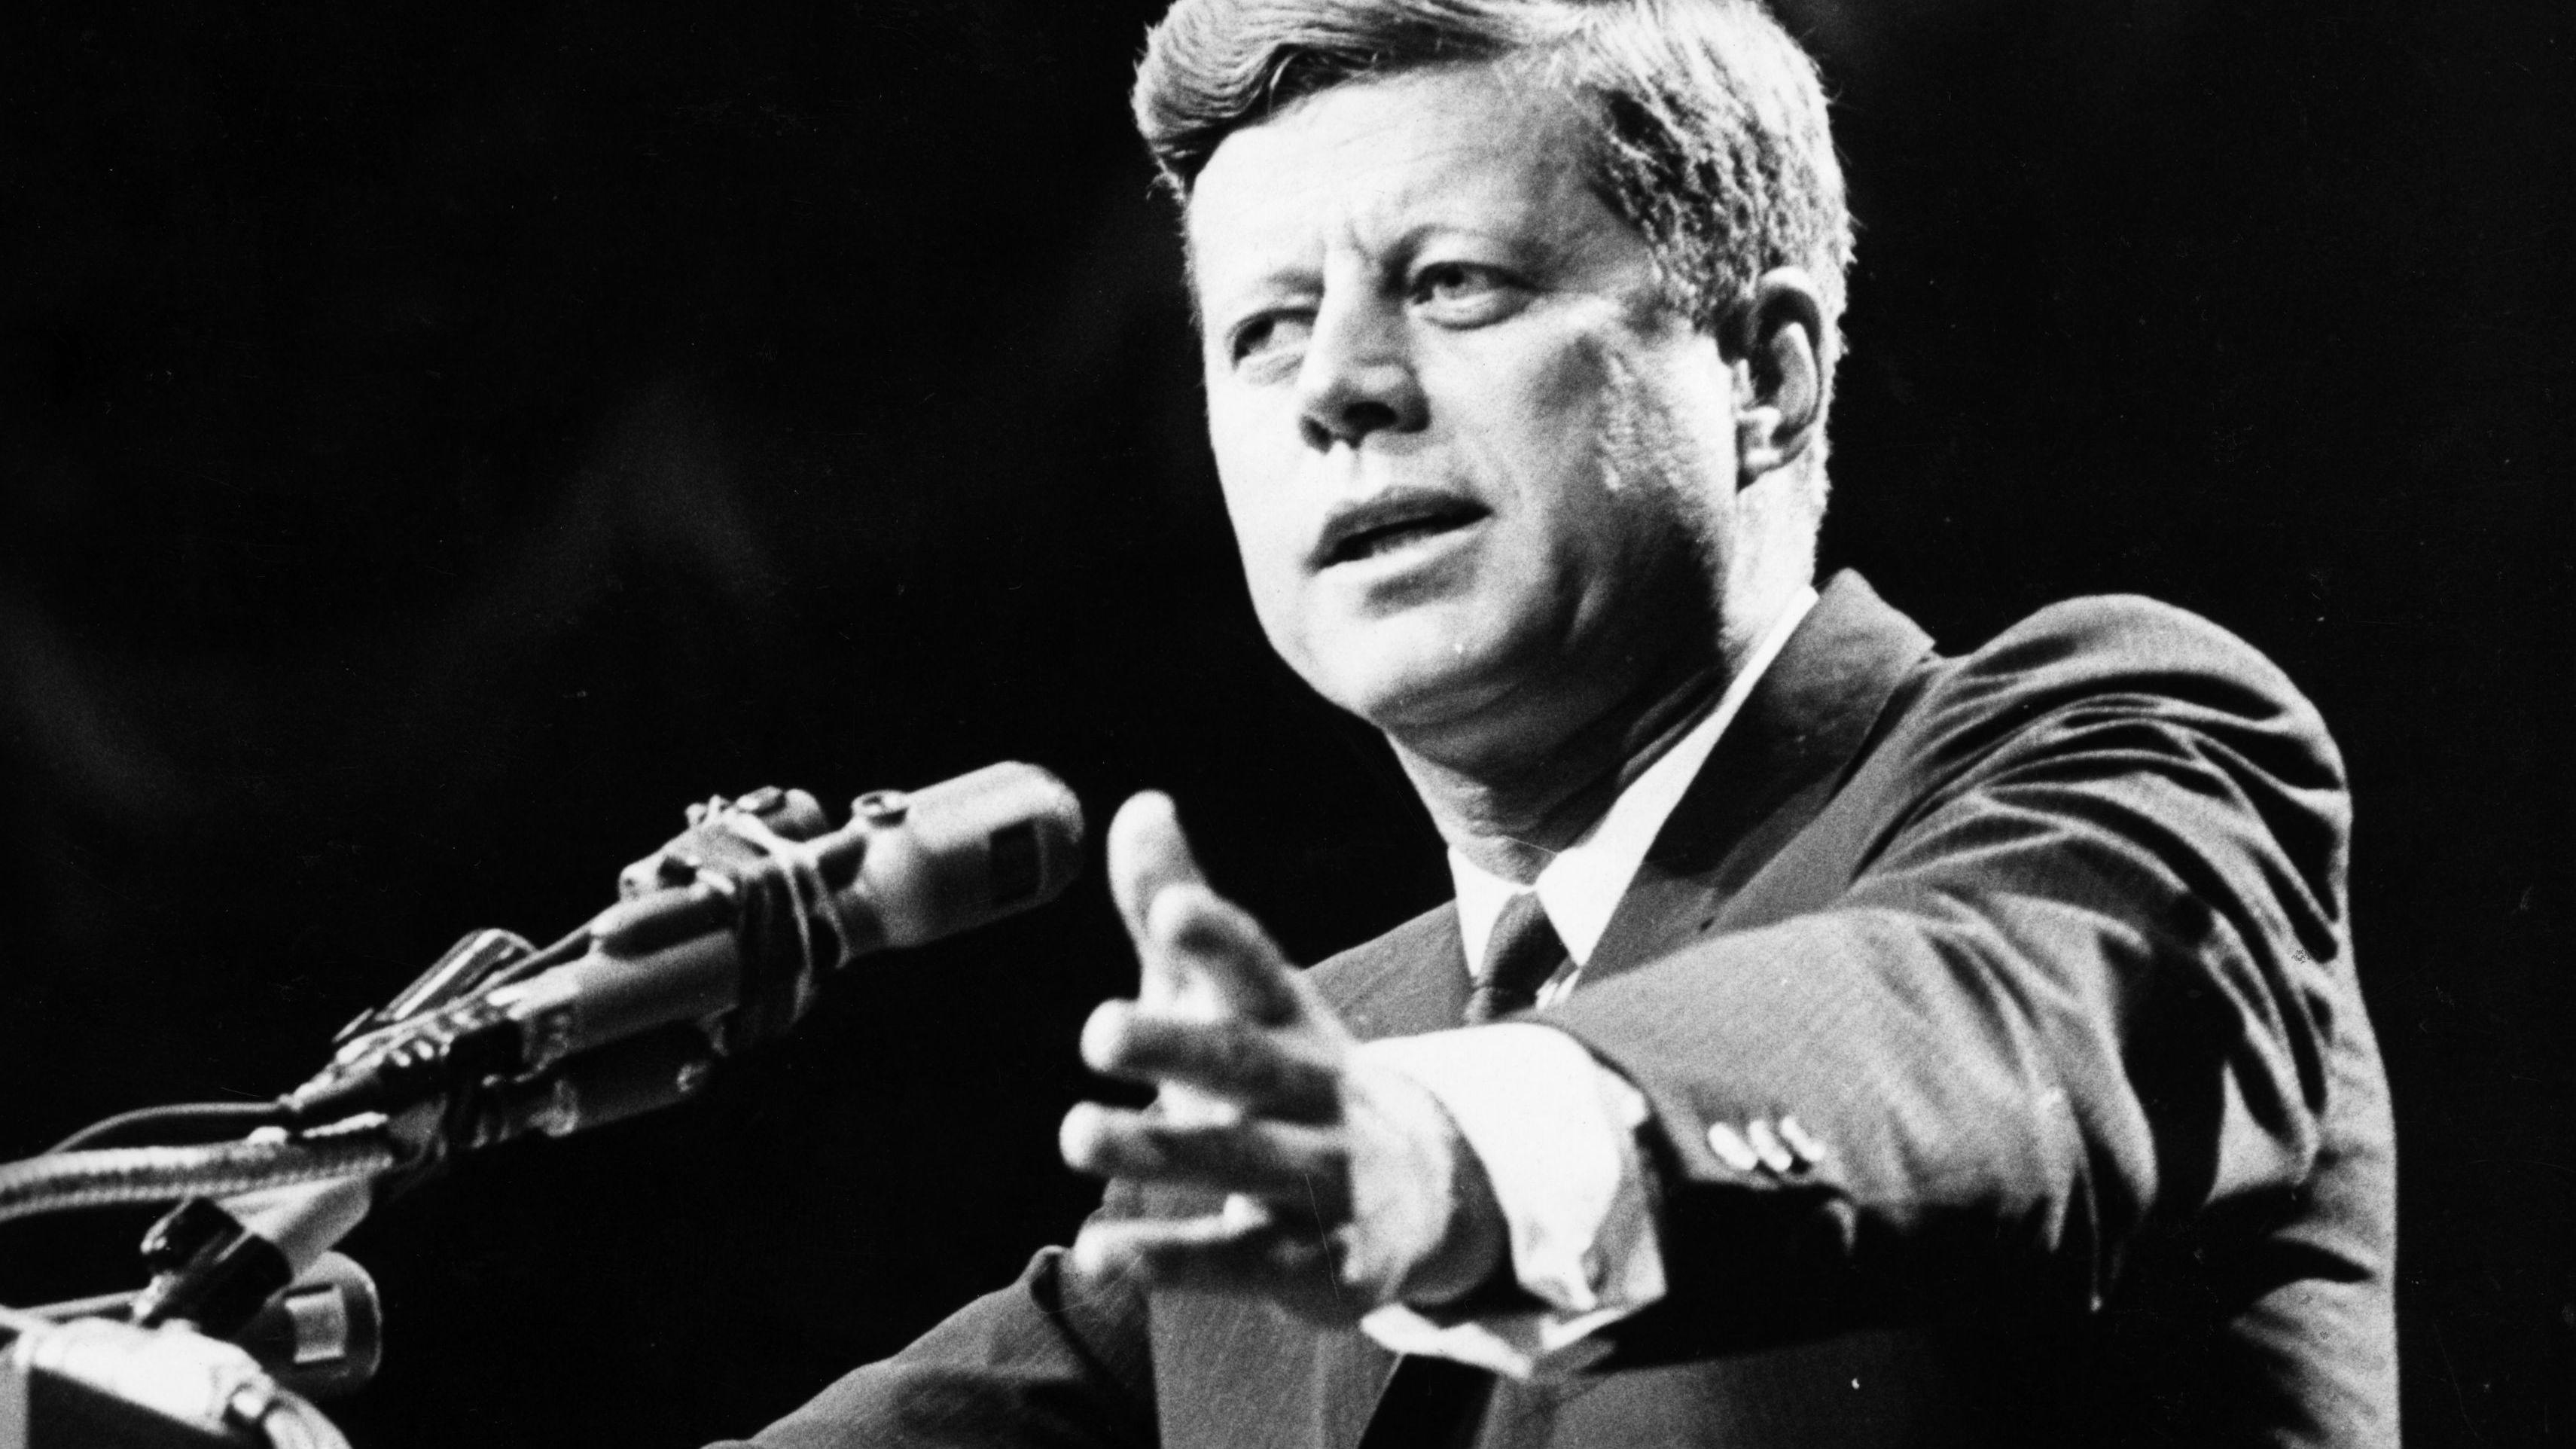 United States Historic Picture Print President KENNEDY Famous Photo JFK Portrait